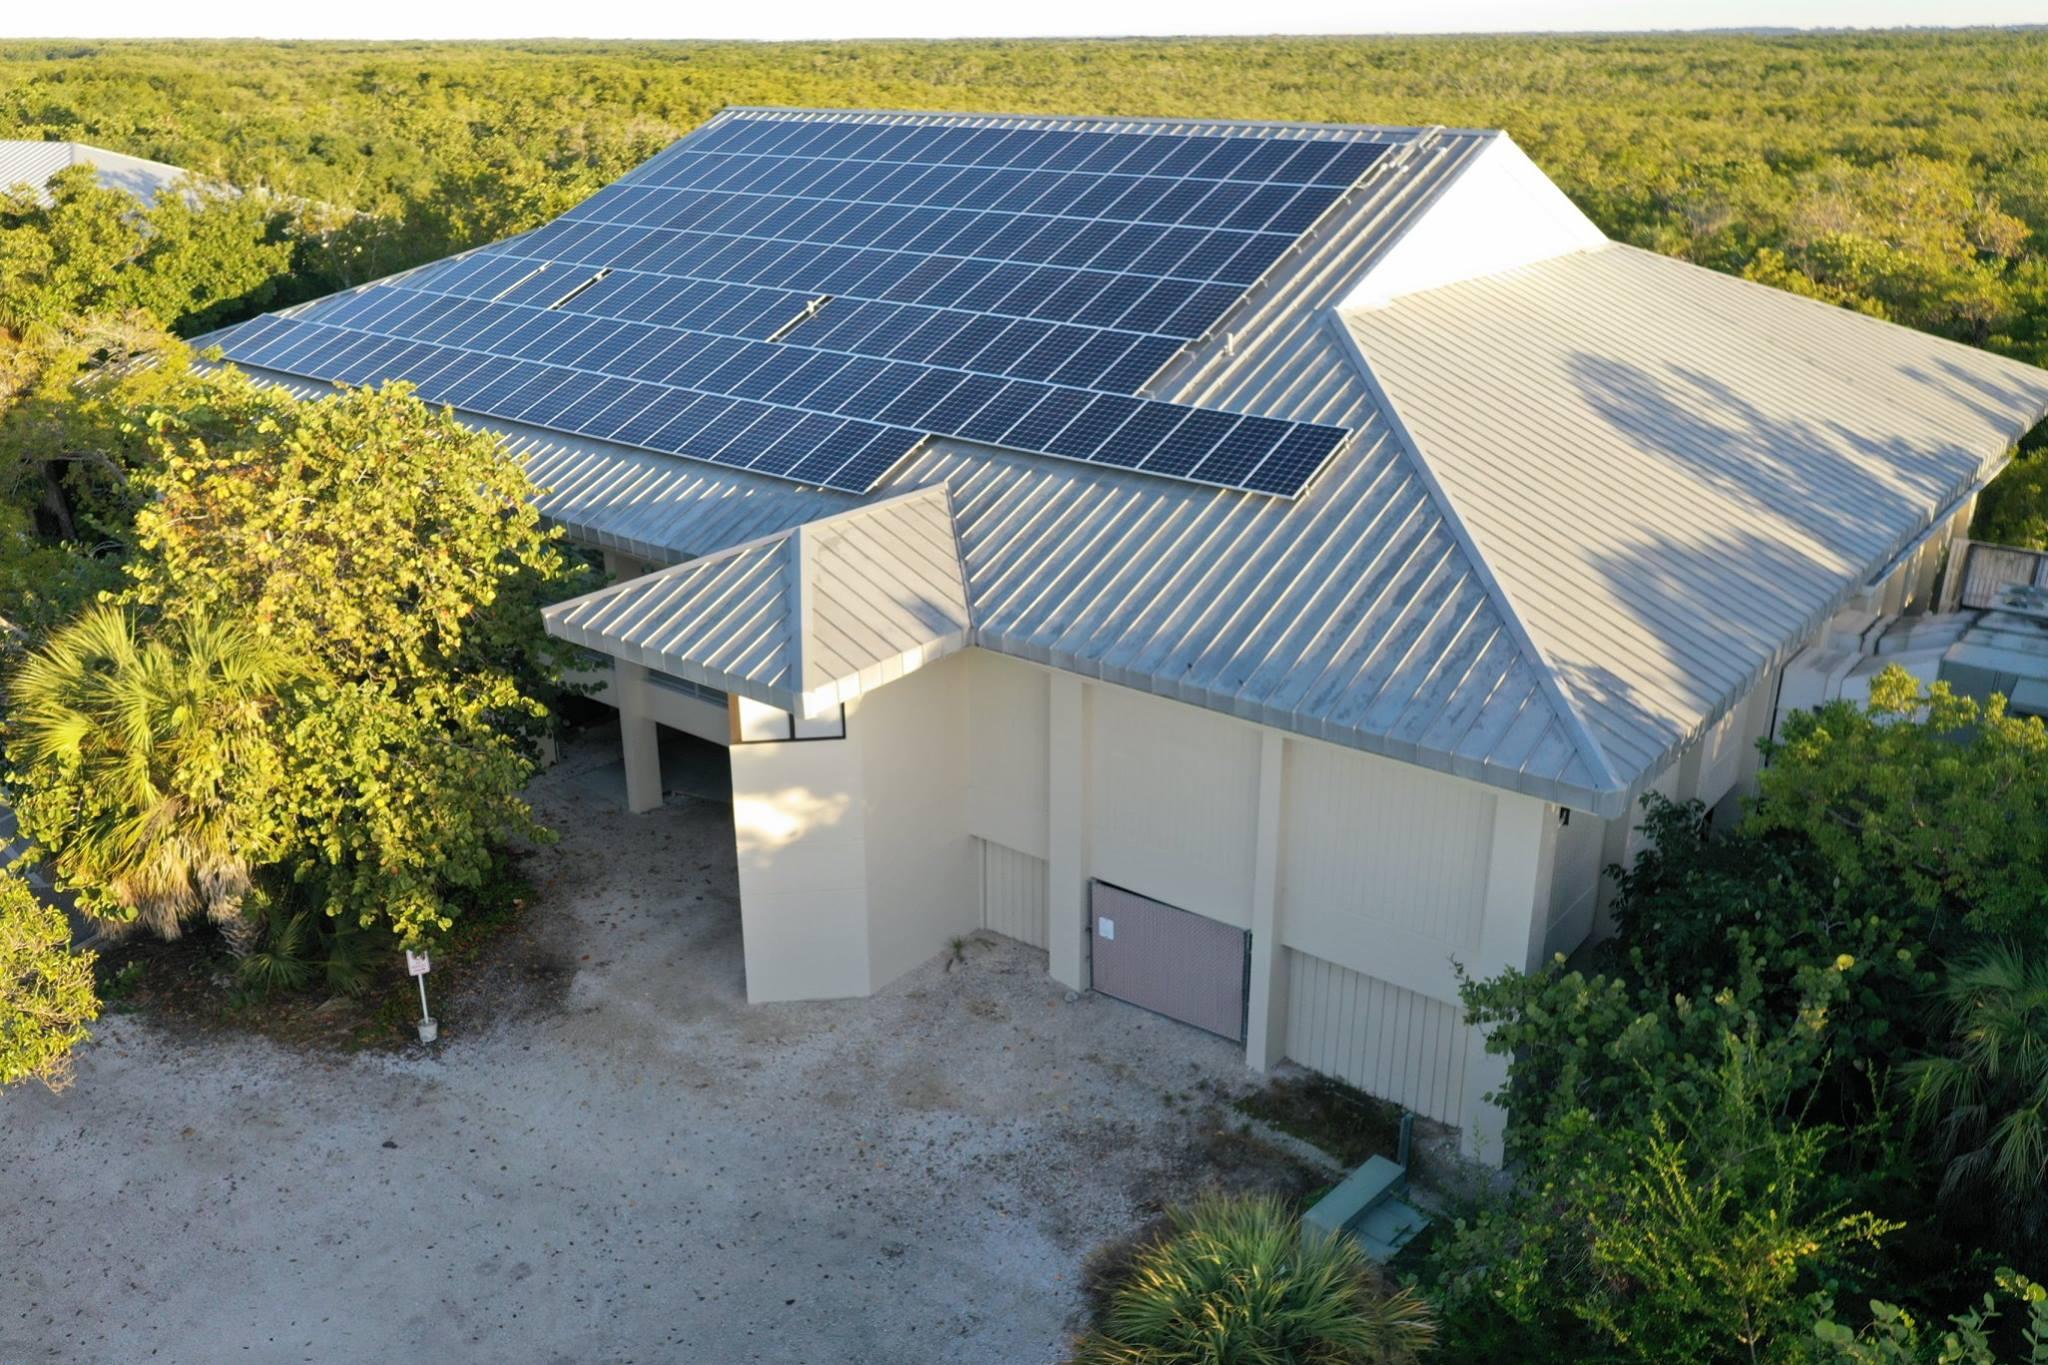 solar panels on ding darling visitor center